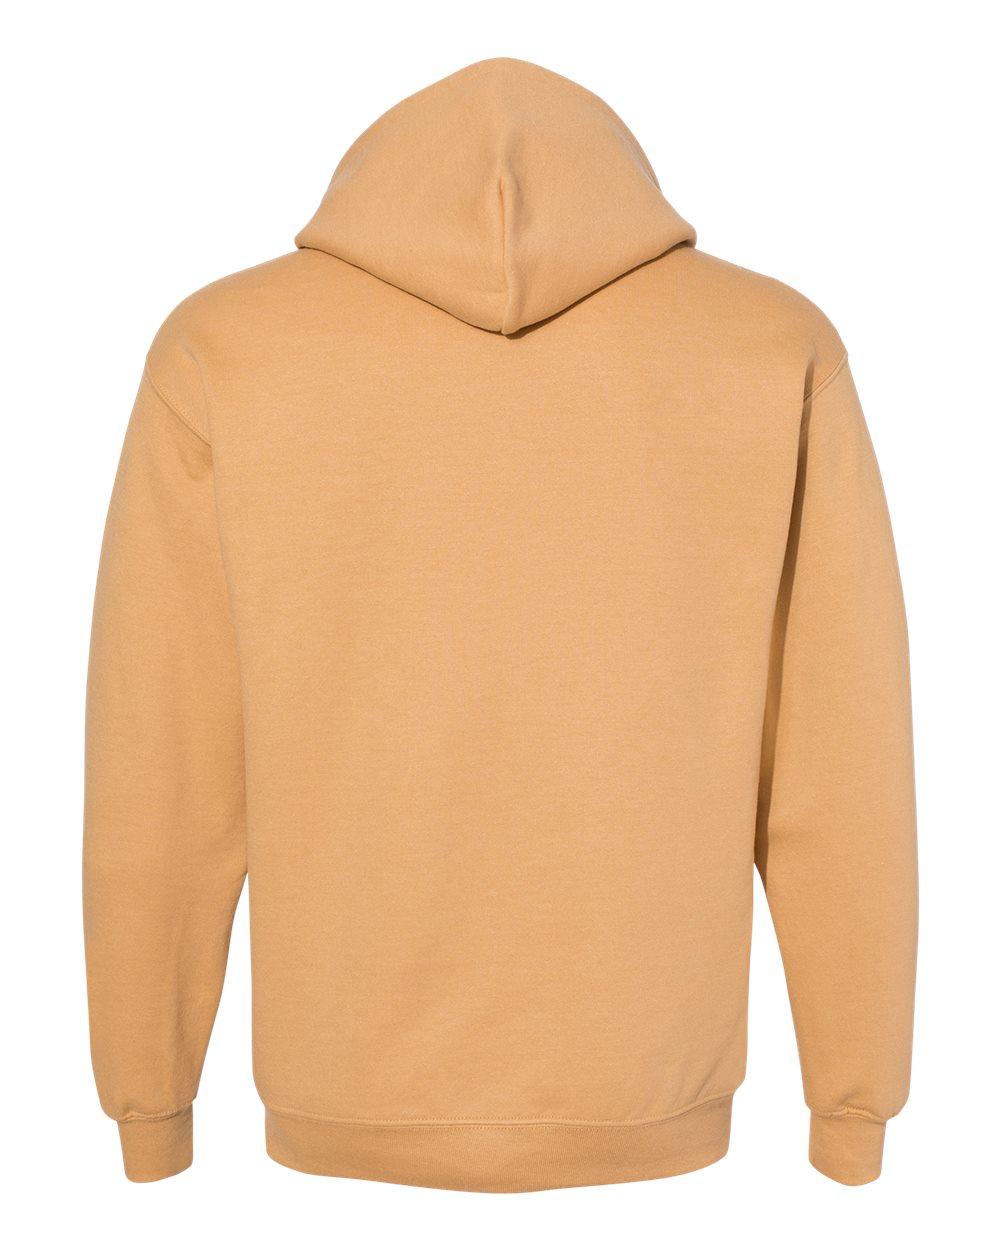 Gildan-Mens-Blank-Hoodie-Heavy-Blend-Hooded-Sweatshirt-Solid-18500-up-to-5XL thumbnail 69